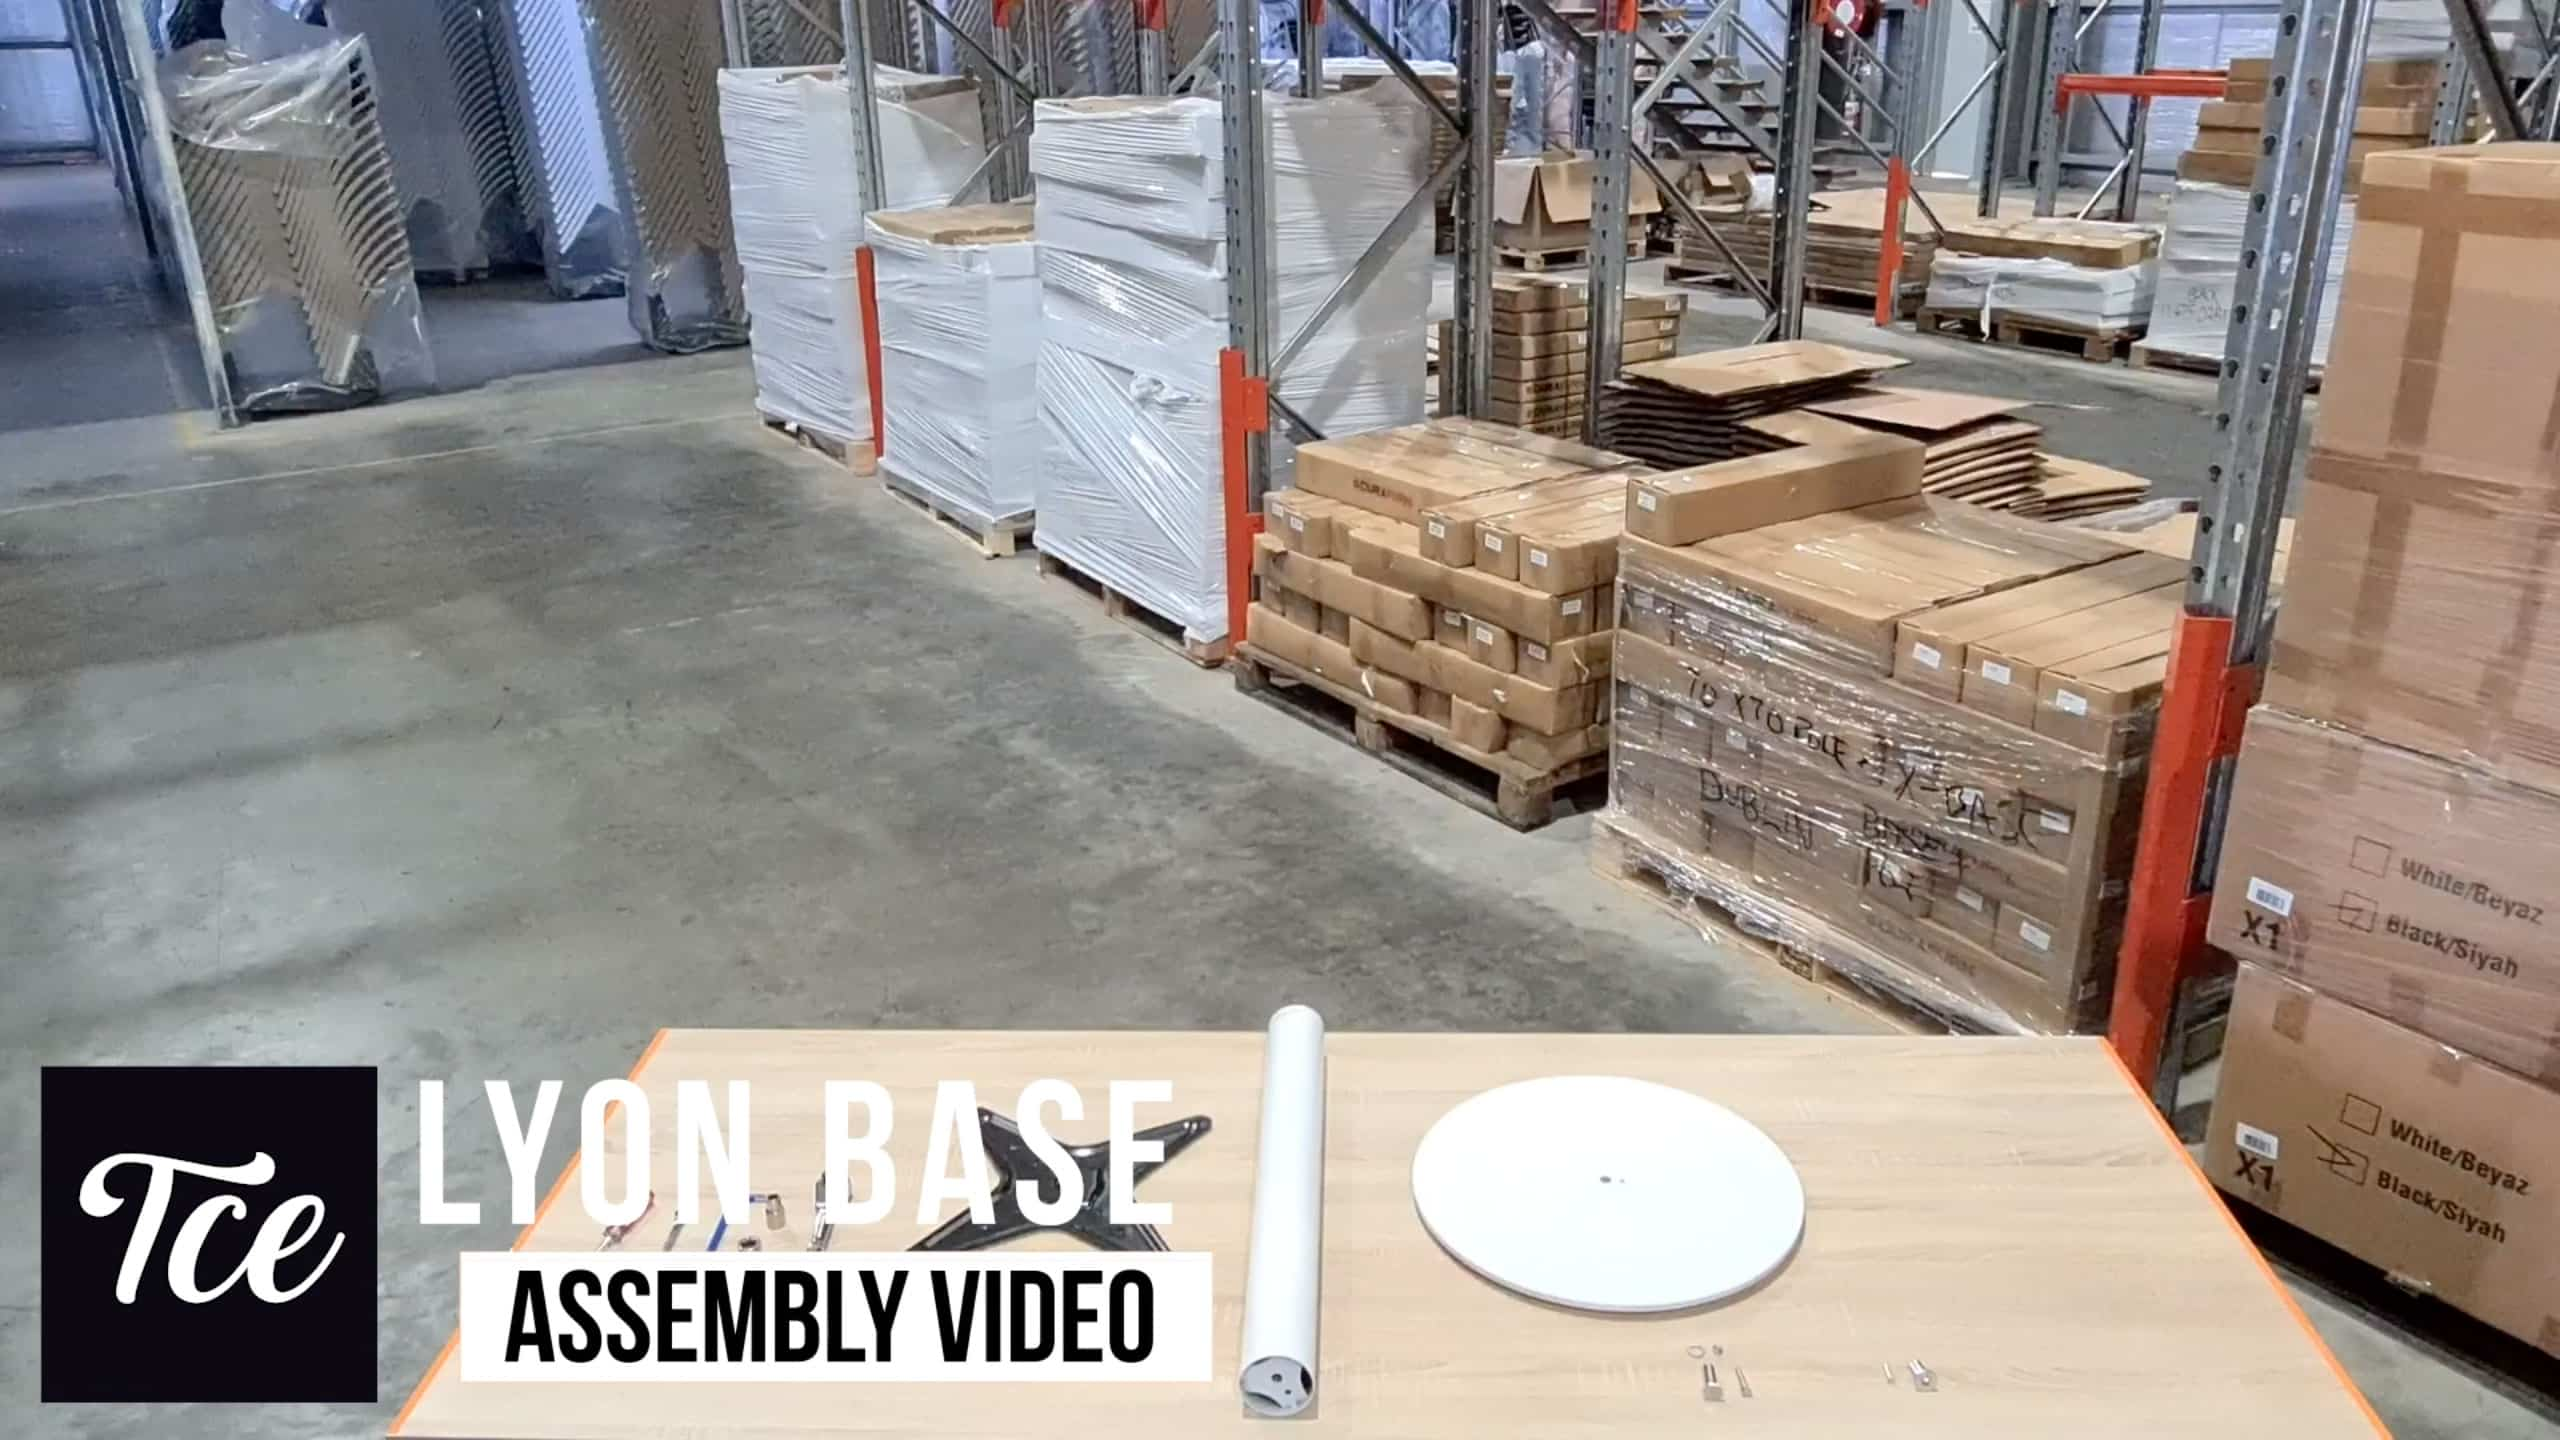 Assembly for the Lyon Base